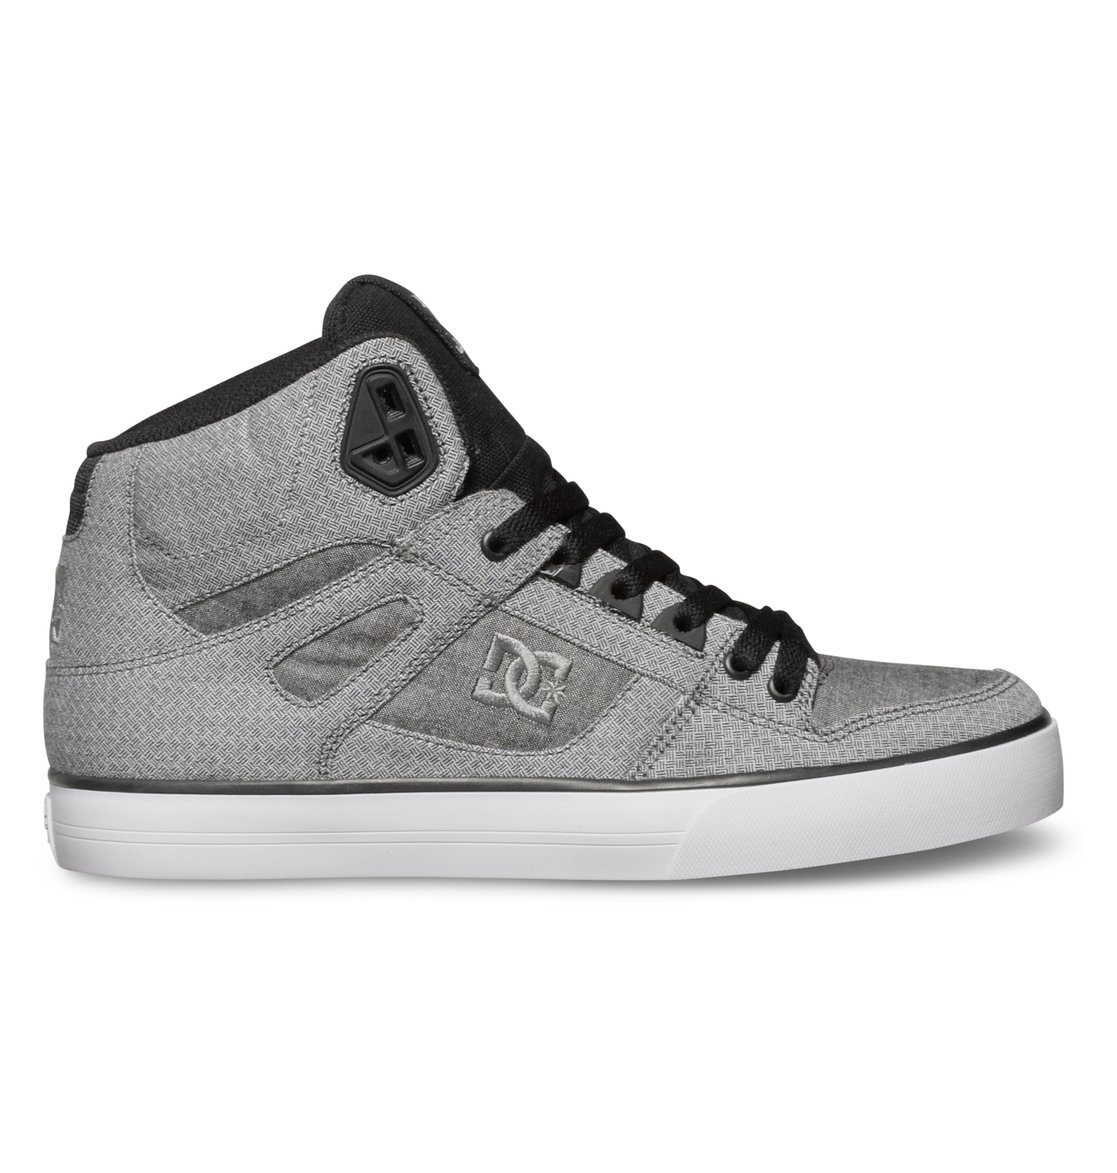 8f222a9b599c 0 Spartan High WC TX SE High Top Shoes ADYS400004 DC Shoes